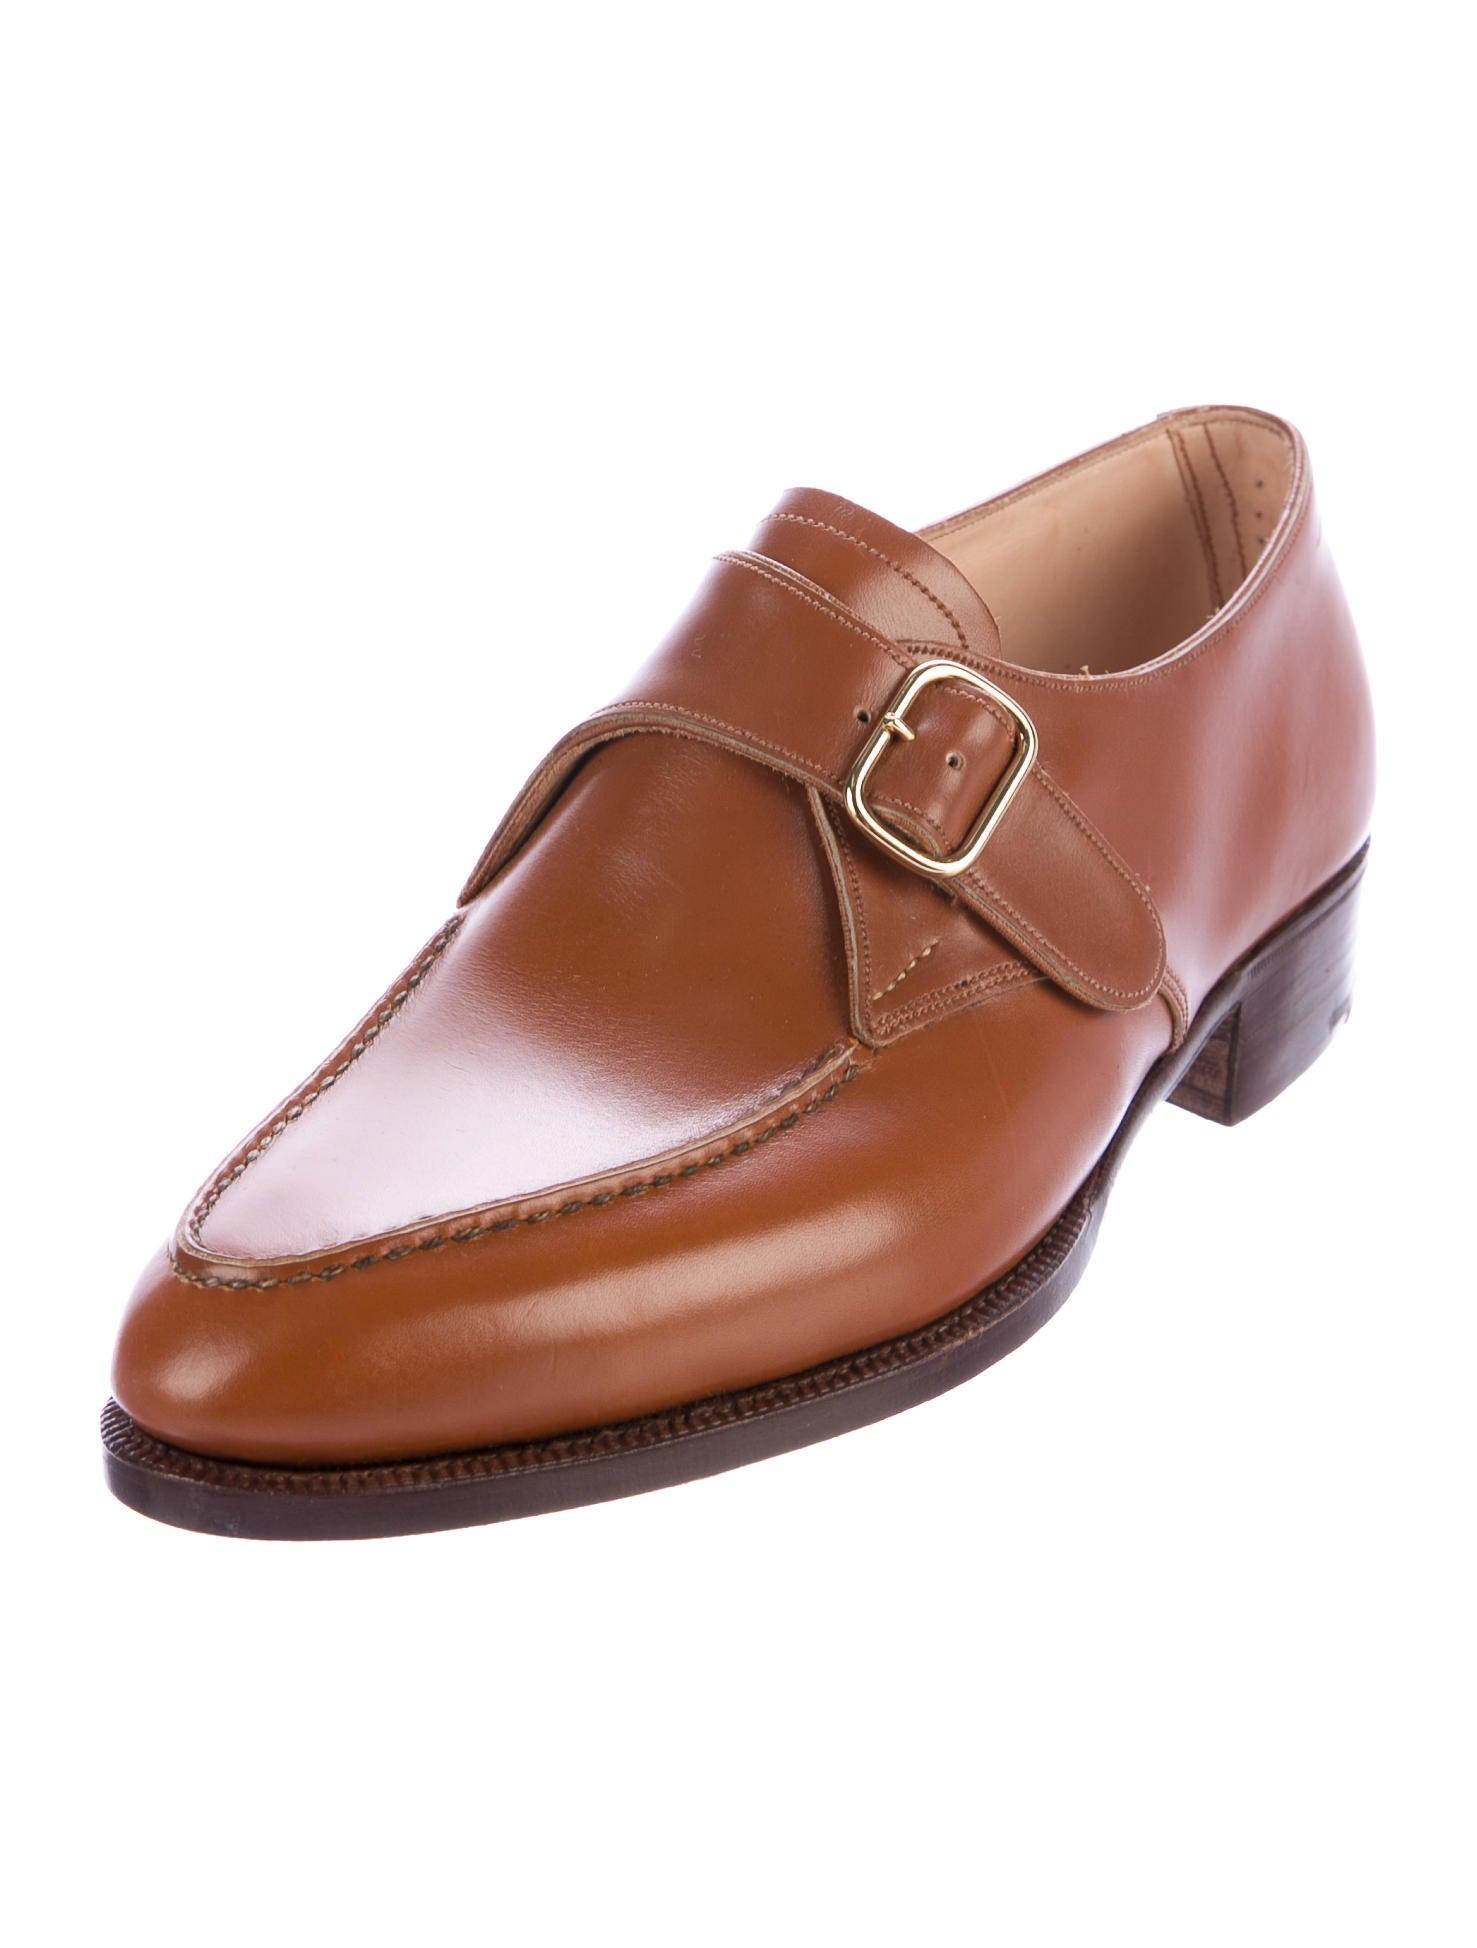 Dress Shoe Dust Bag